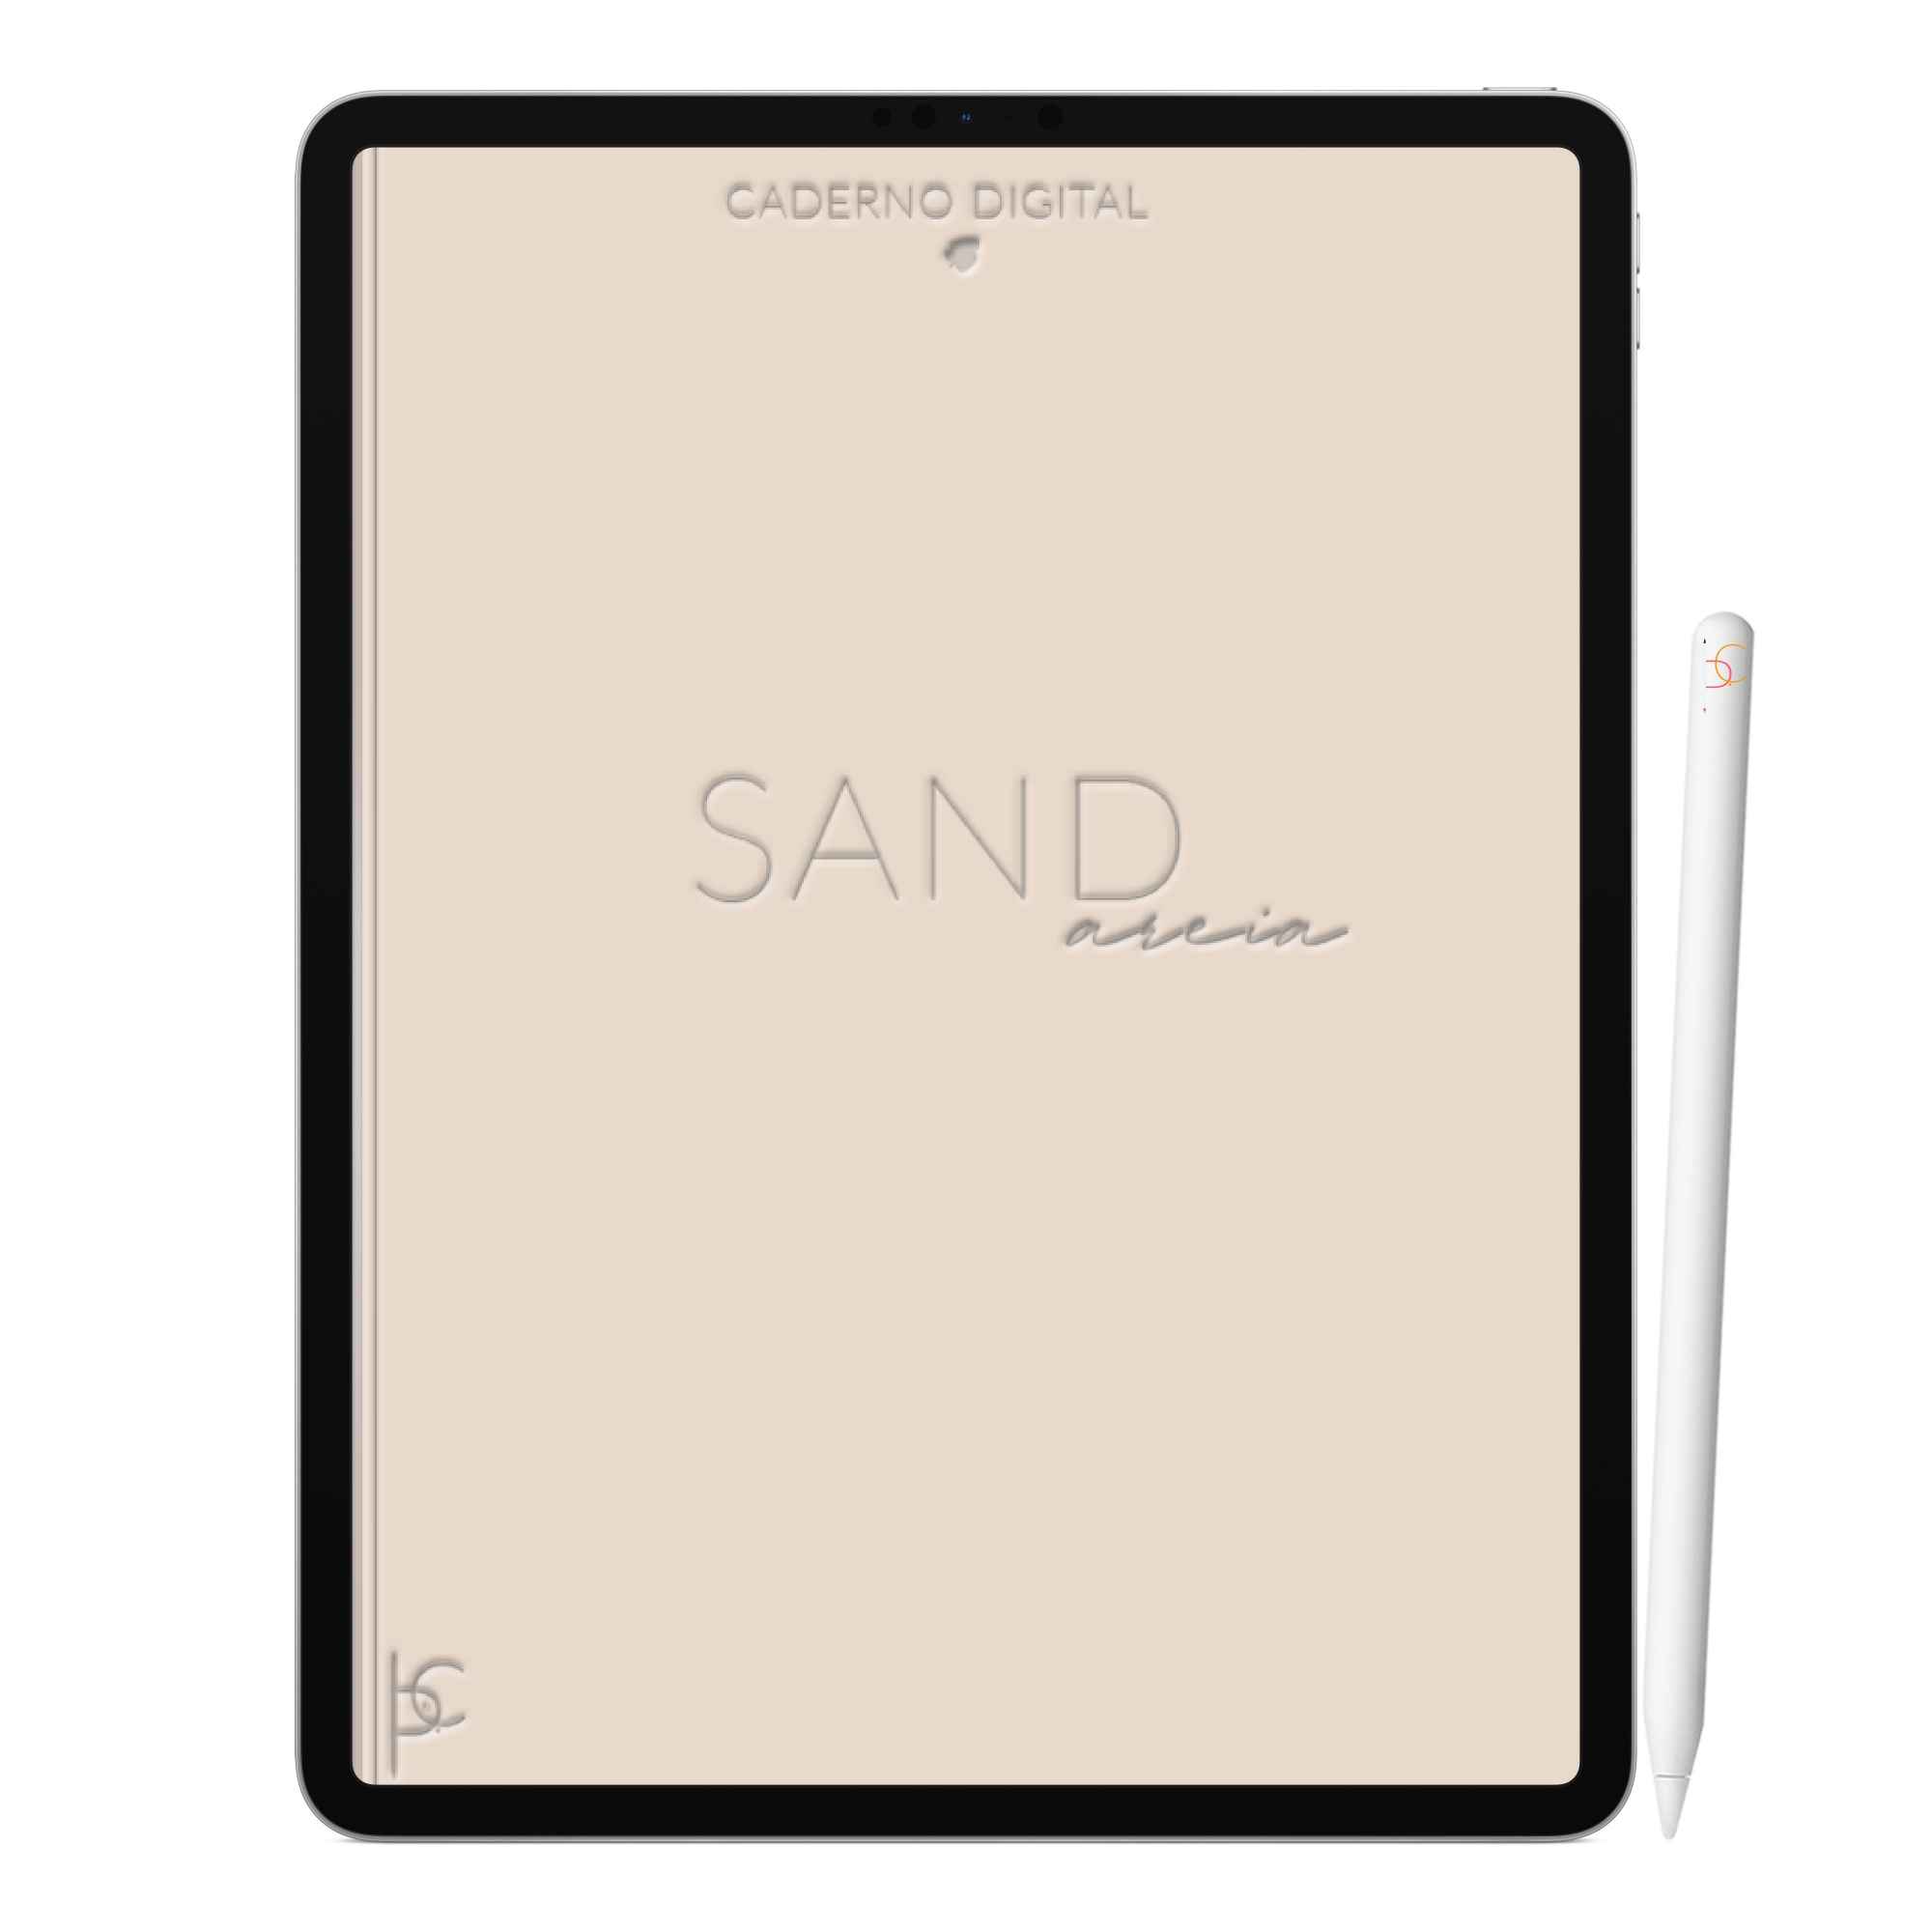 Caderno Digital Minimalista Sand Areia | Dez Divisórias Interativo| iPad Tablet | Download Instantâneo